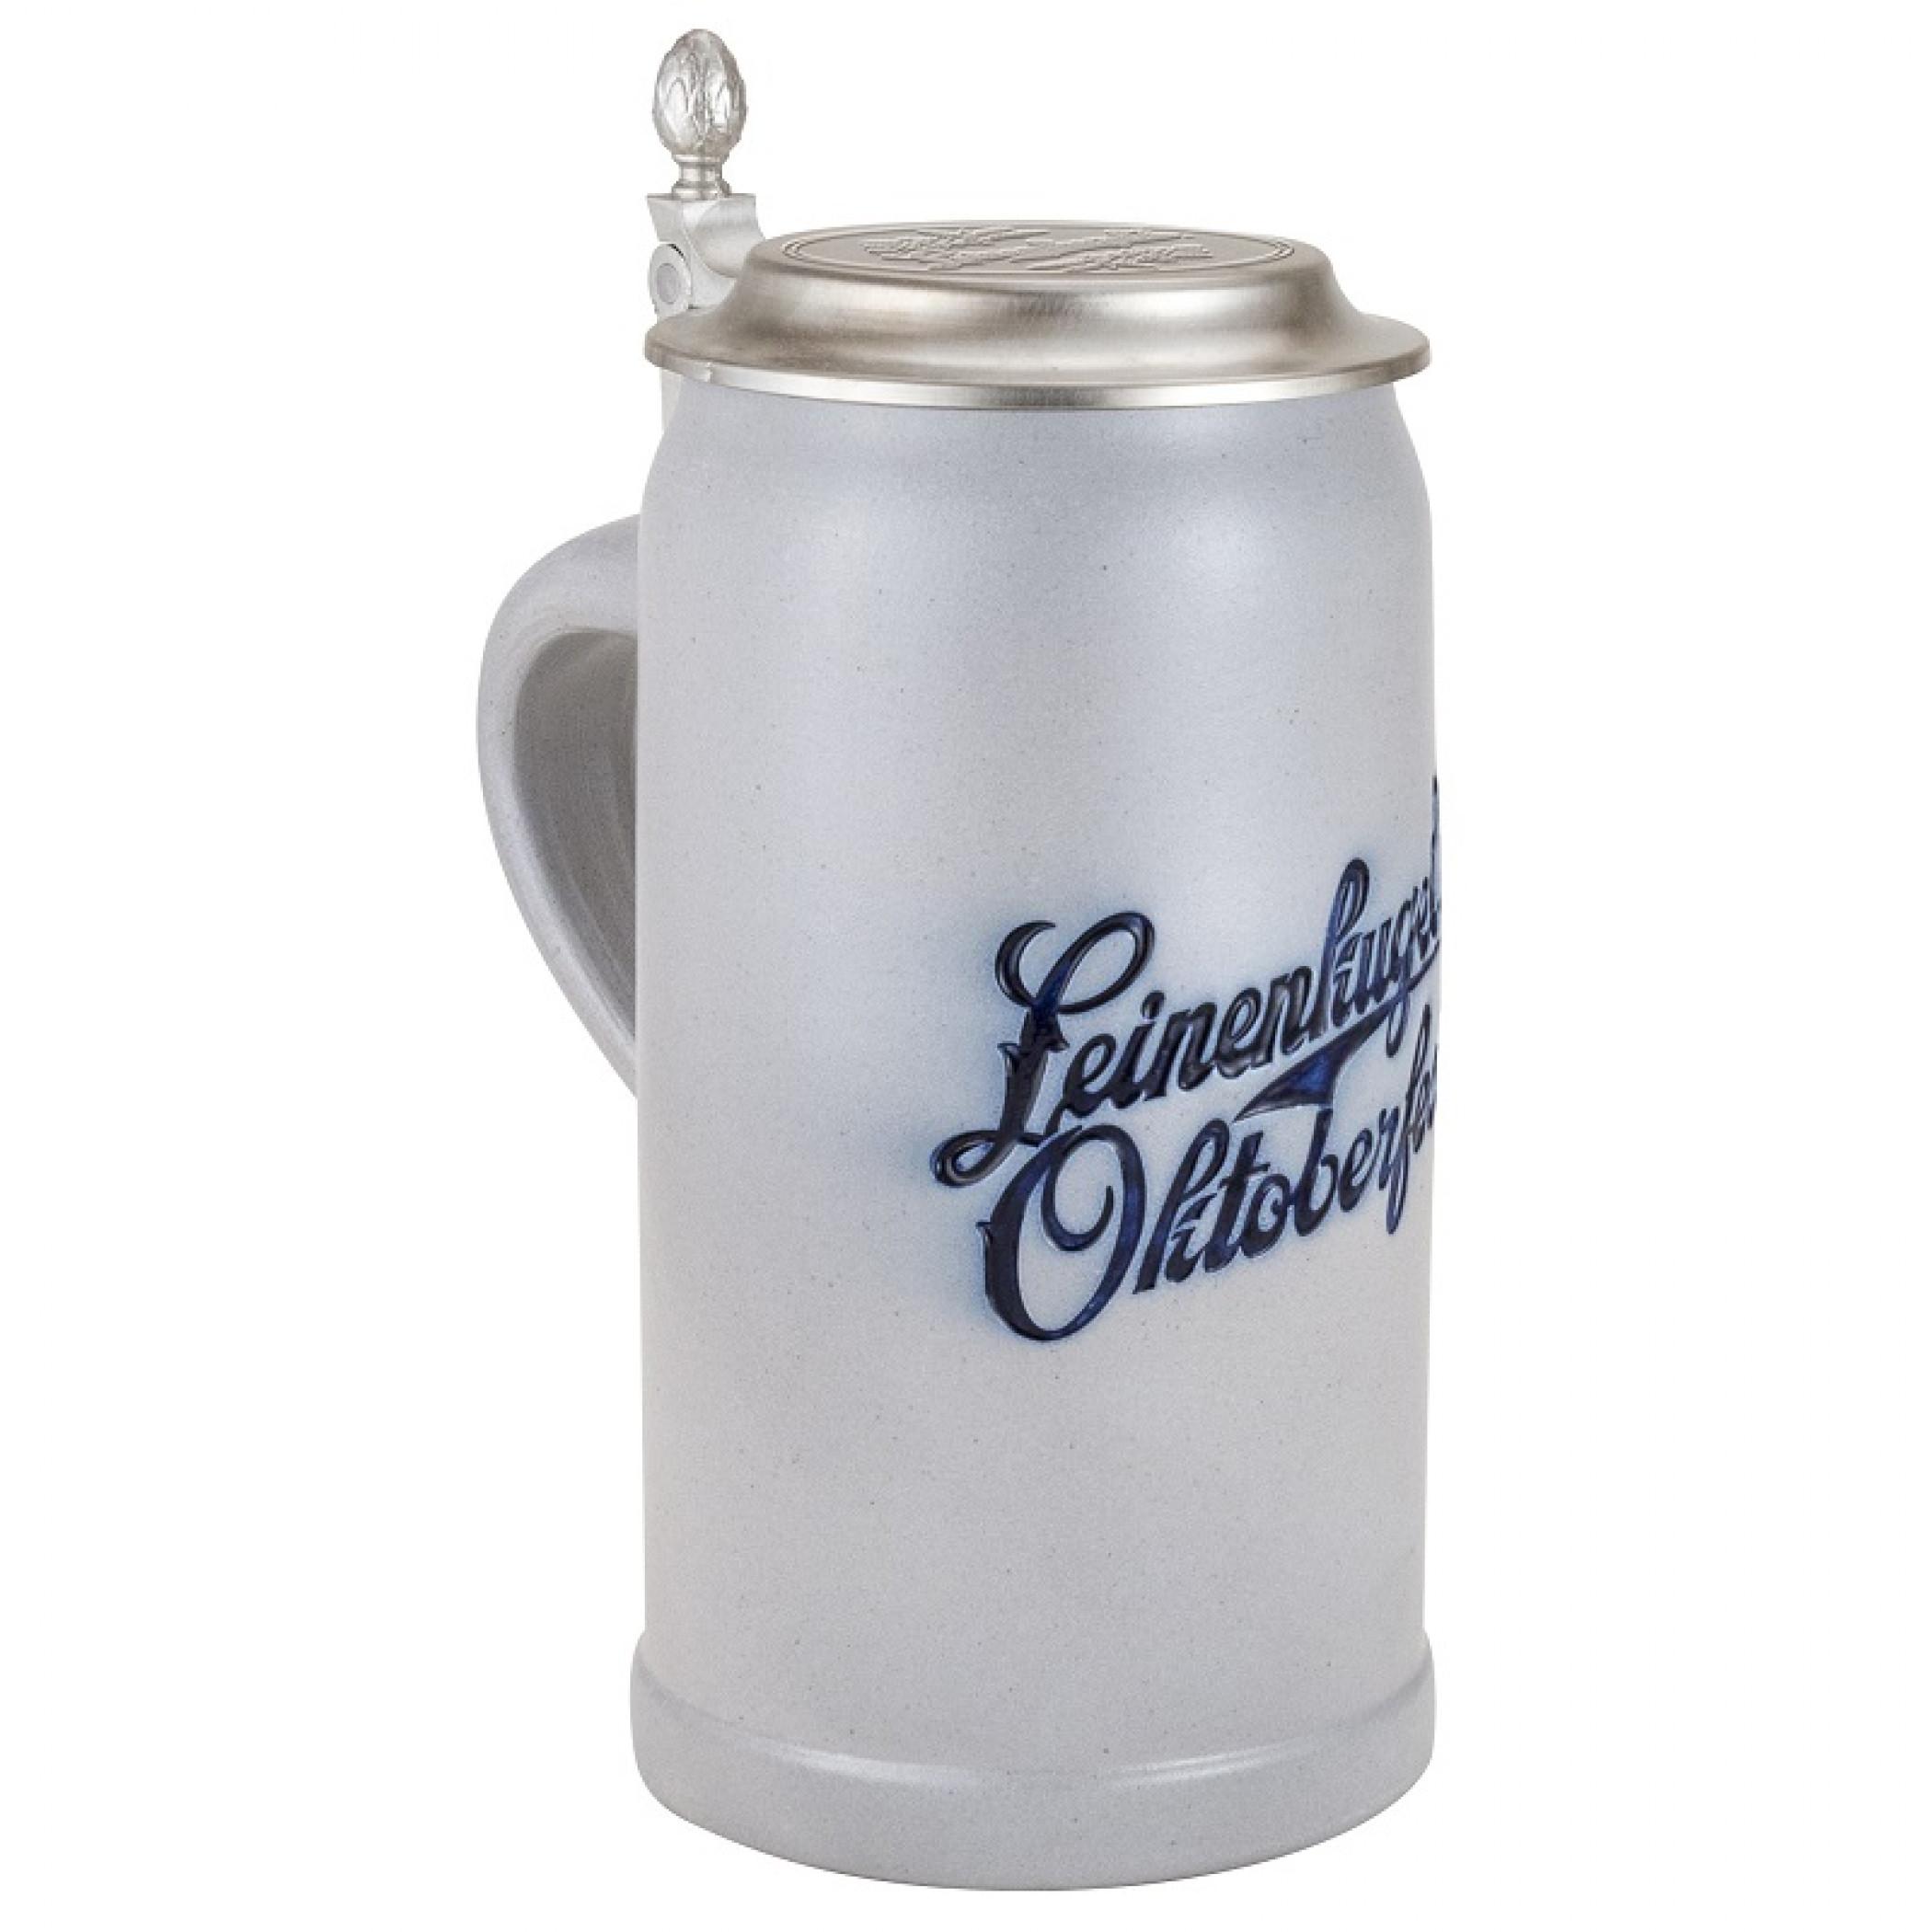 Leinenkugel Tall Beer Mug With Metal Lid